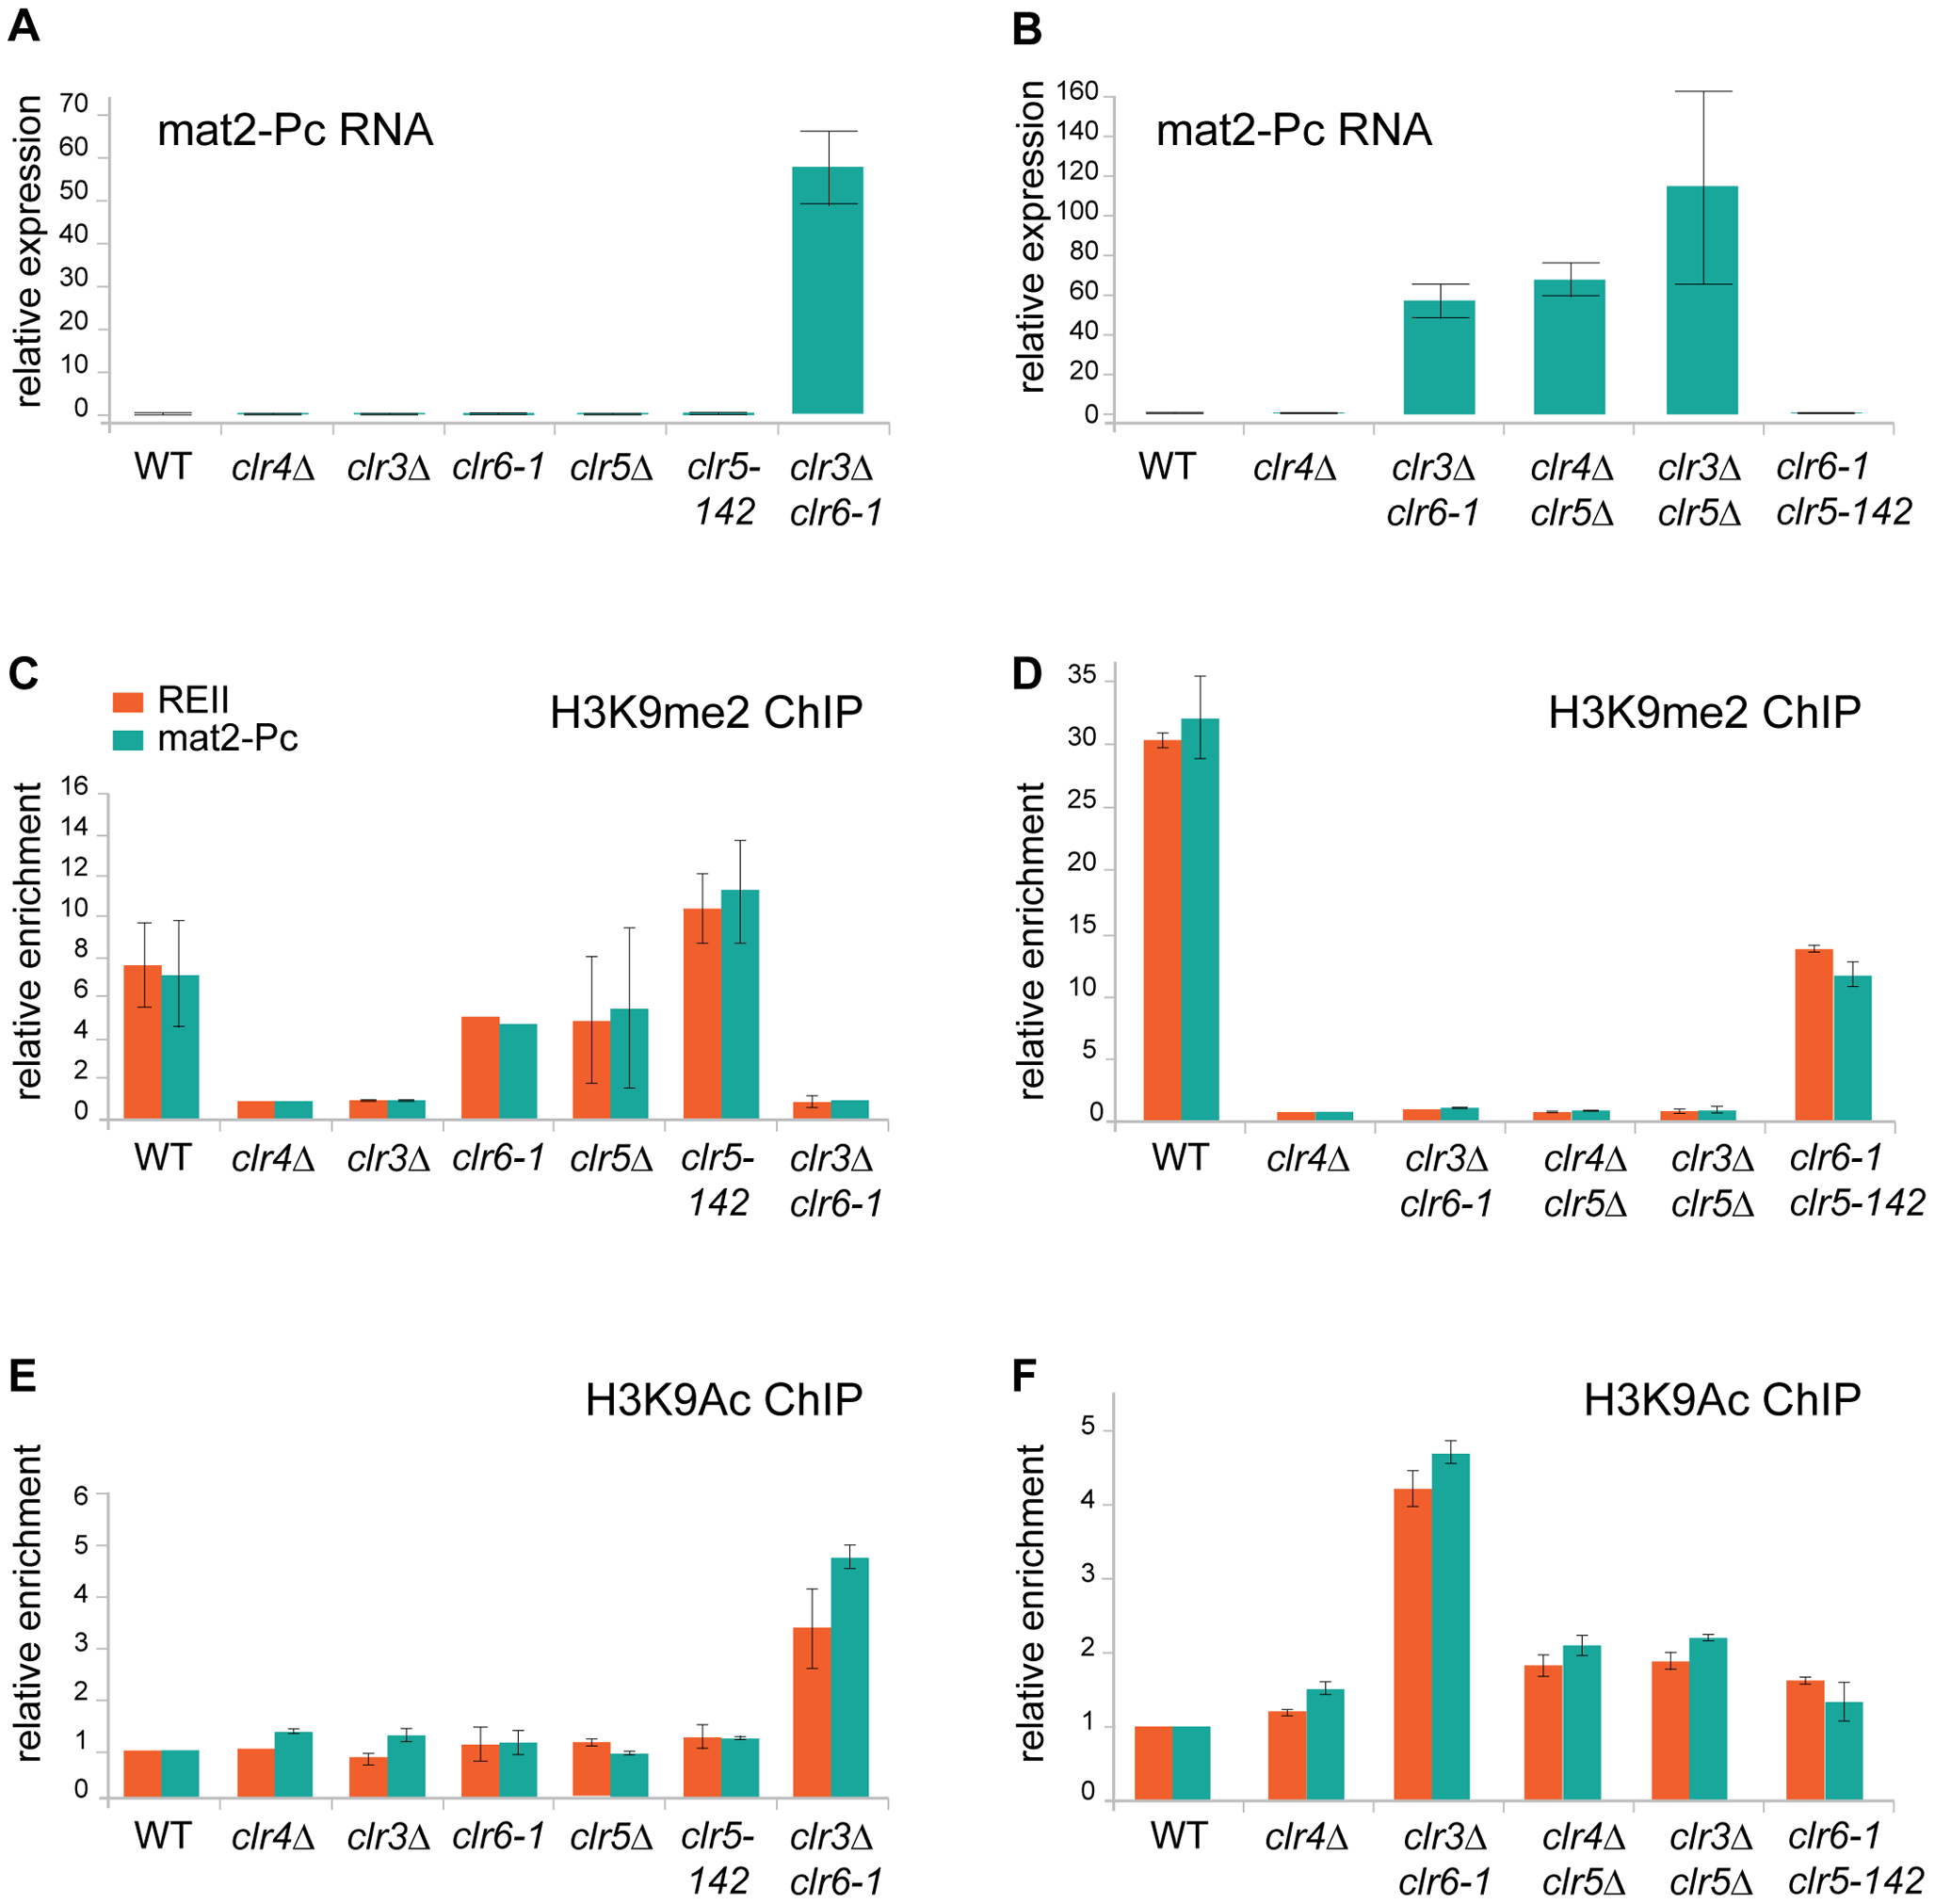 Chromatin modifications and <i>mat2-Pc</i> expression in <i>clr5</i> mutants.